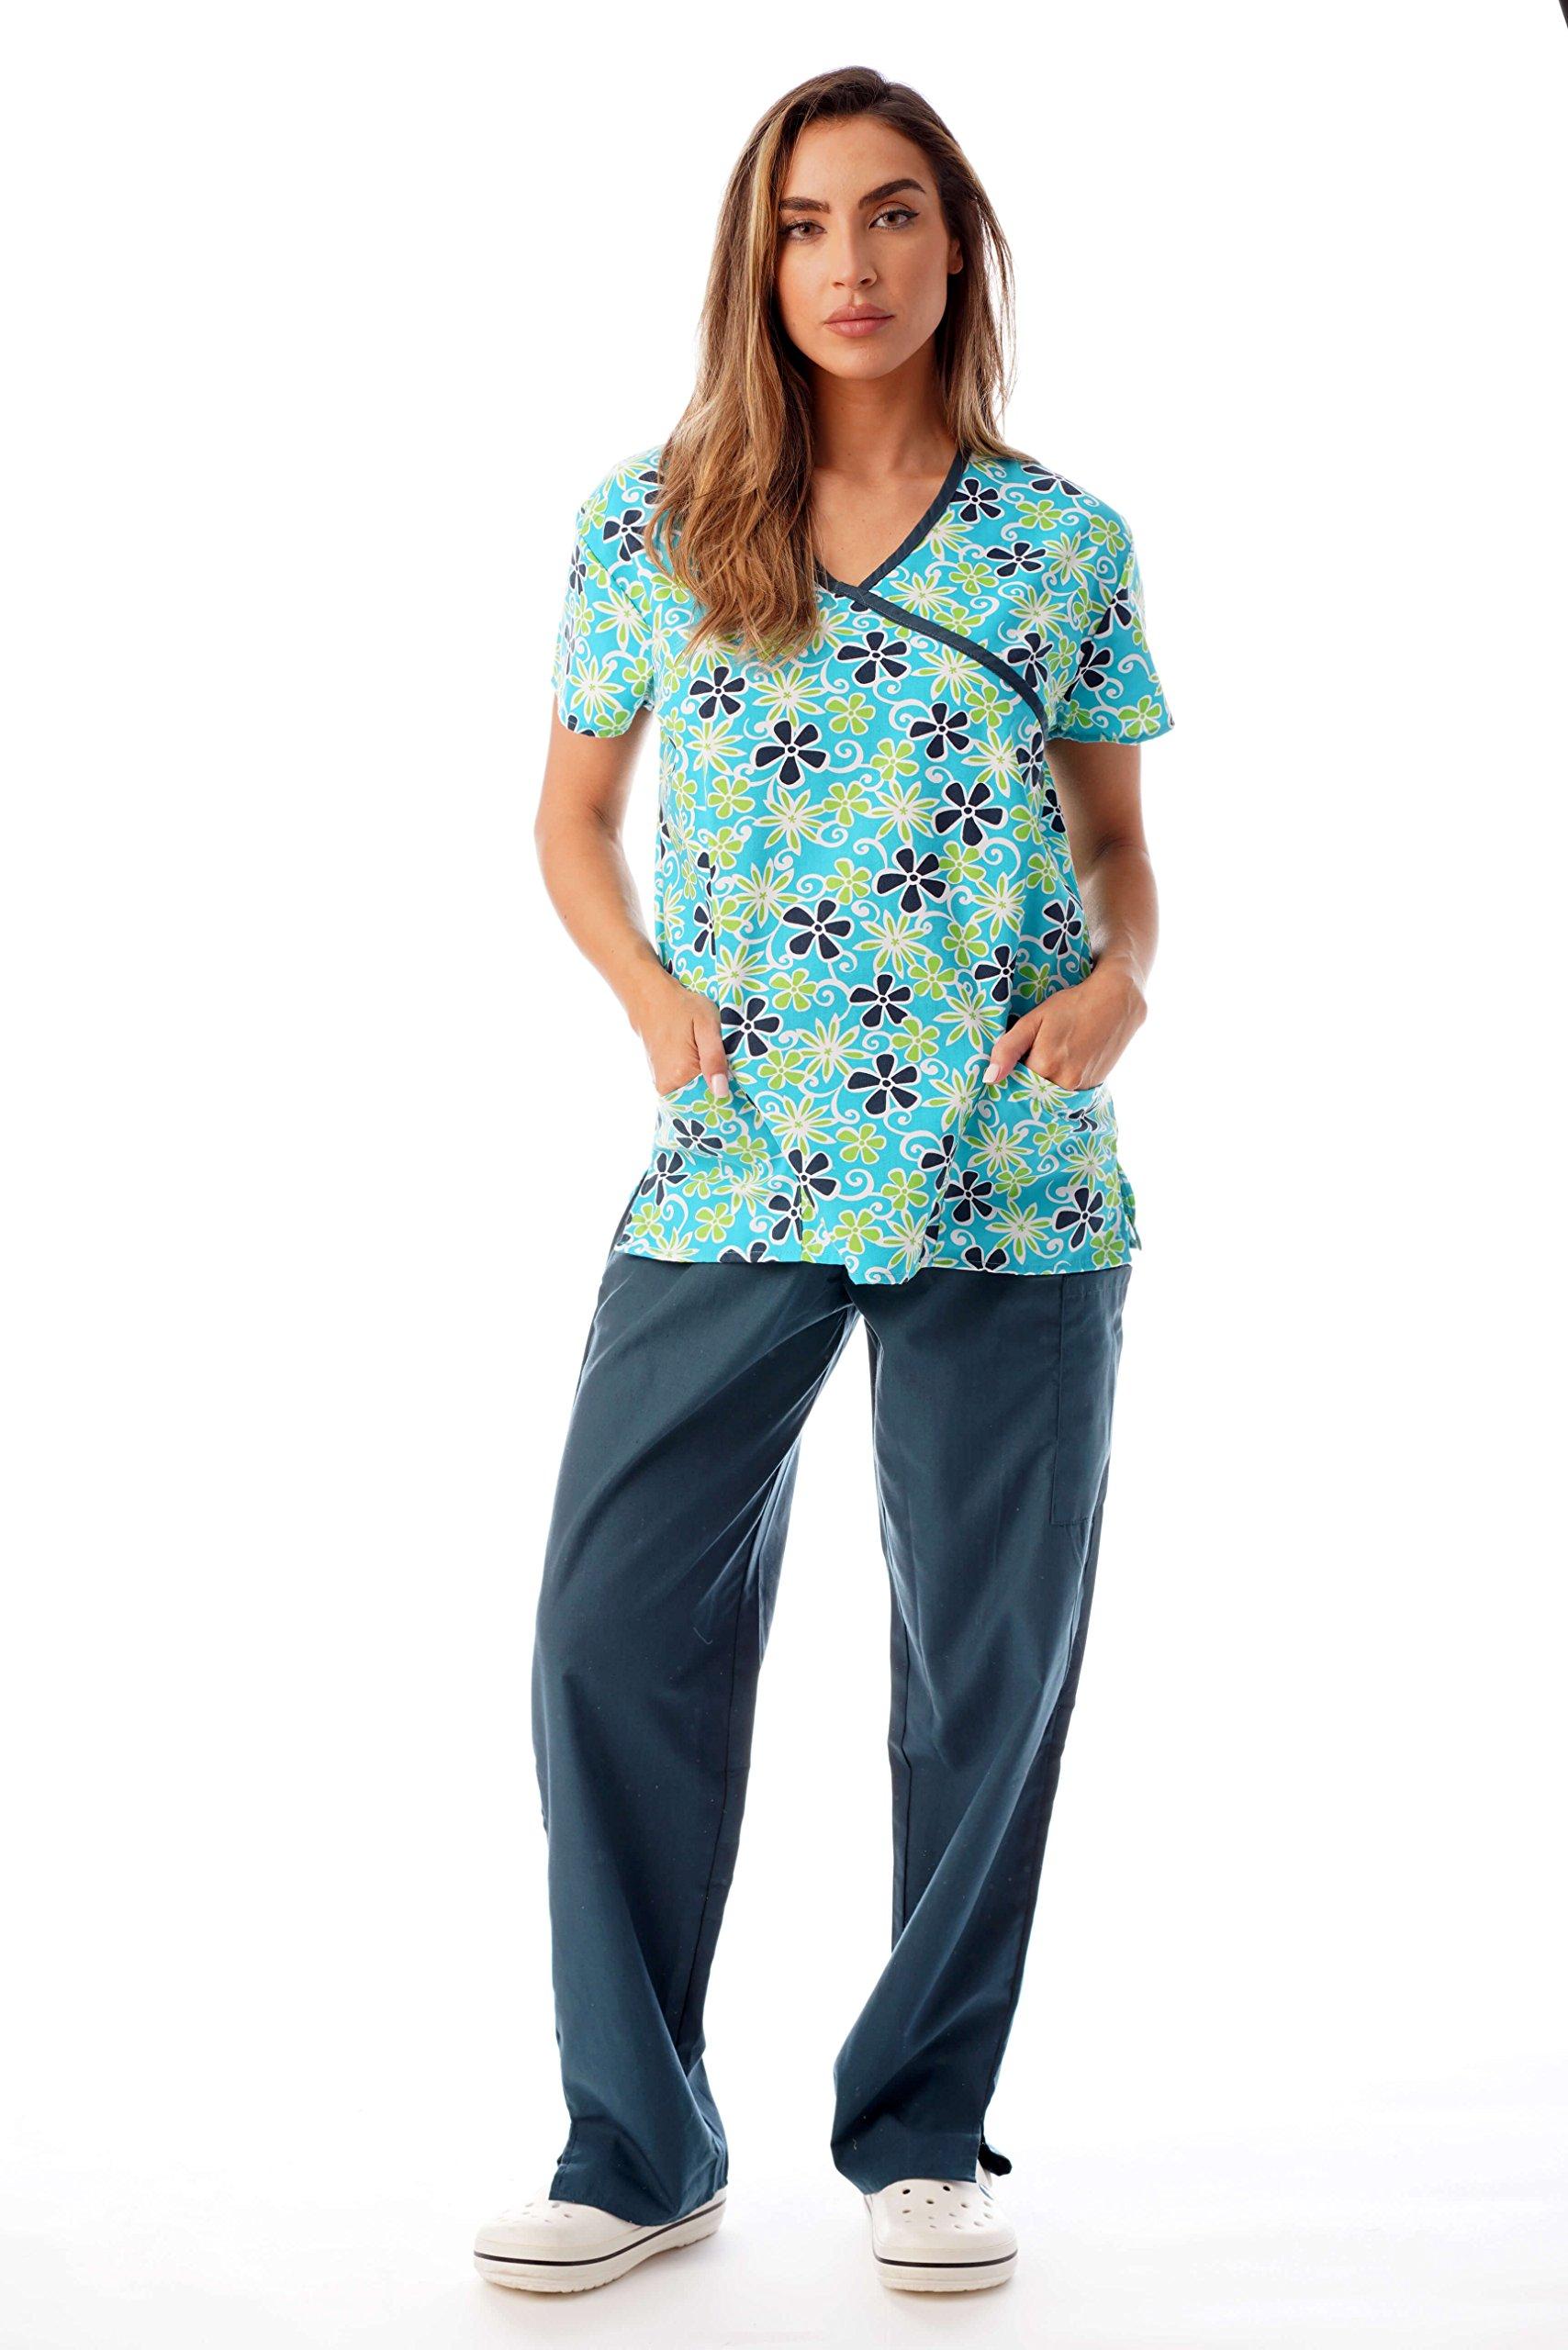 Just Love Nursing Scrubs Set for Women Print Scrubs 1311W-12-L